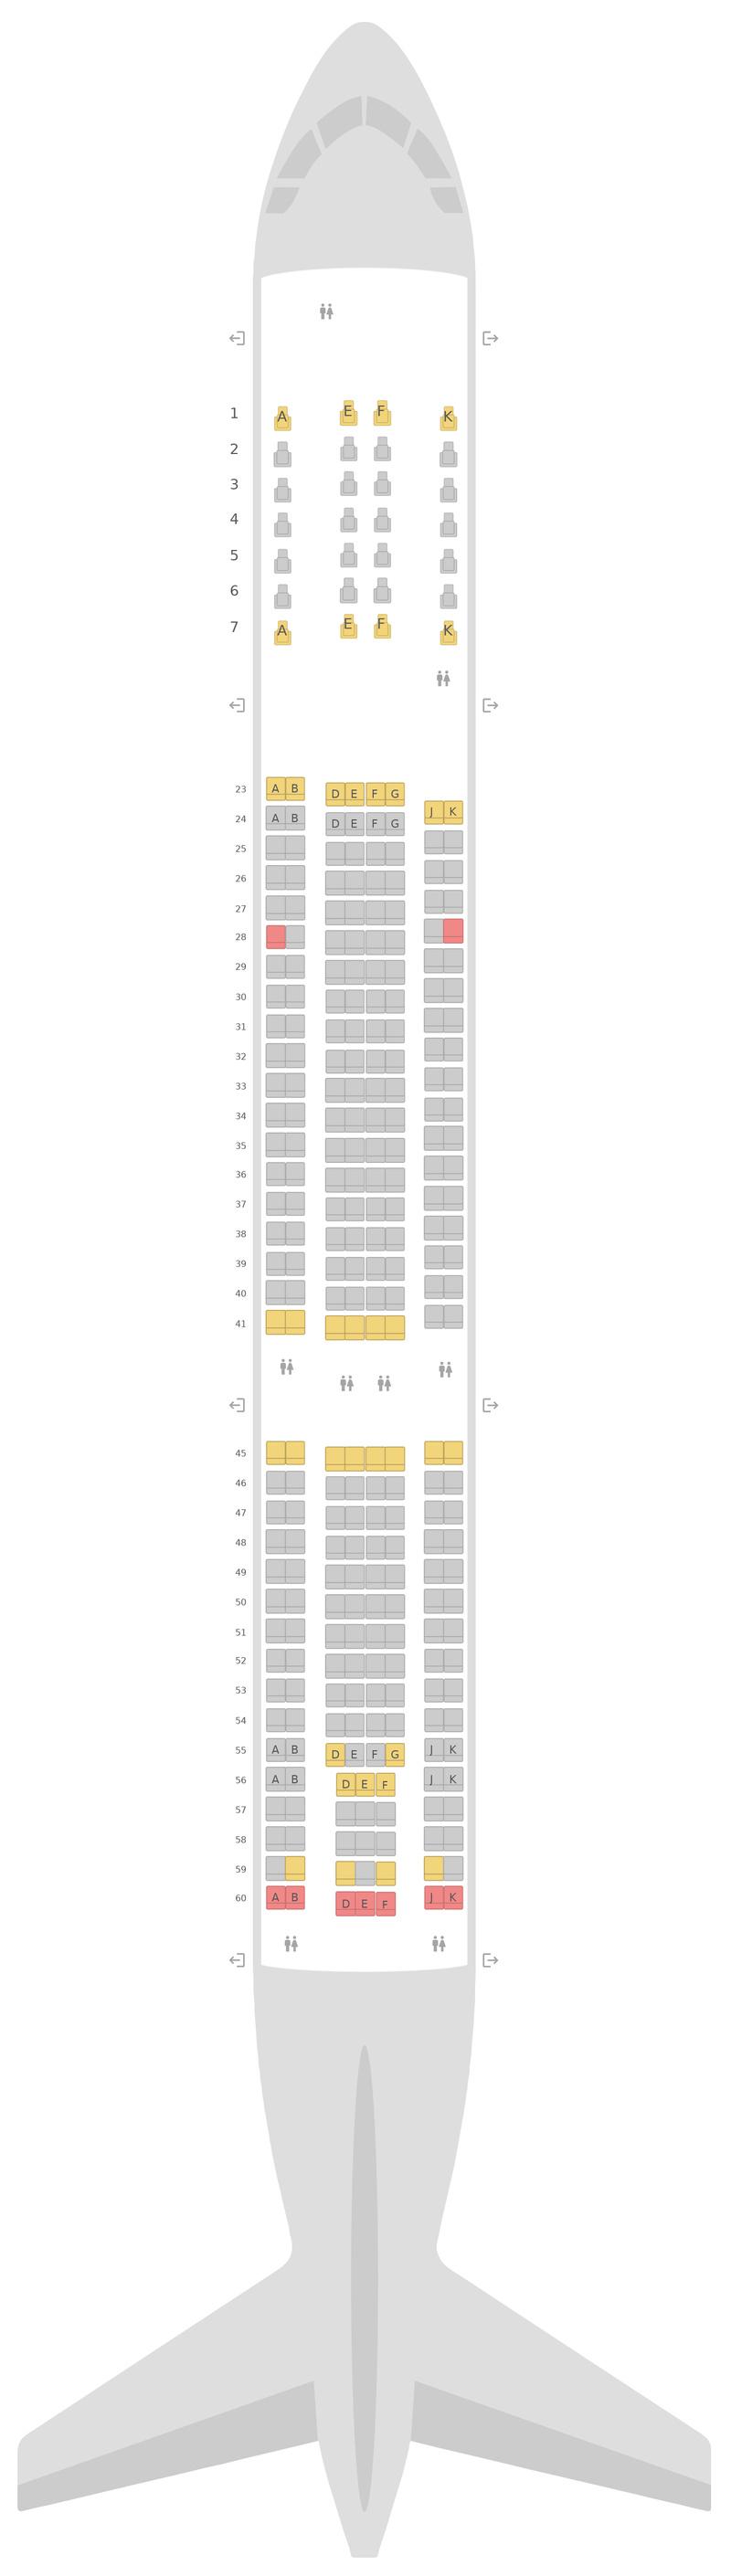 Seat Map Qantas Airbus A330-300 (333)